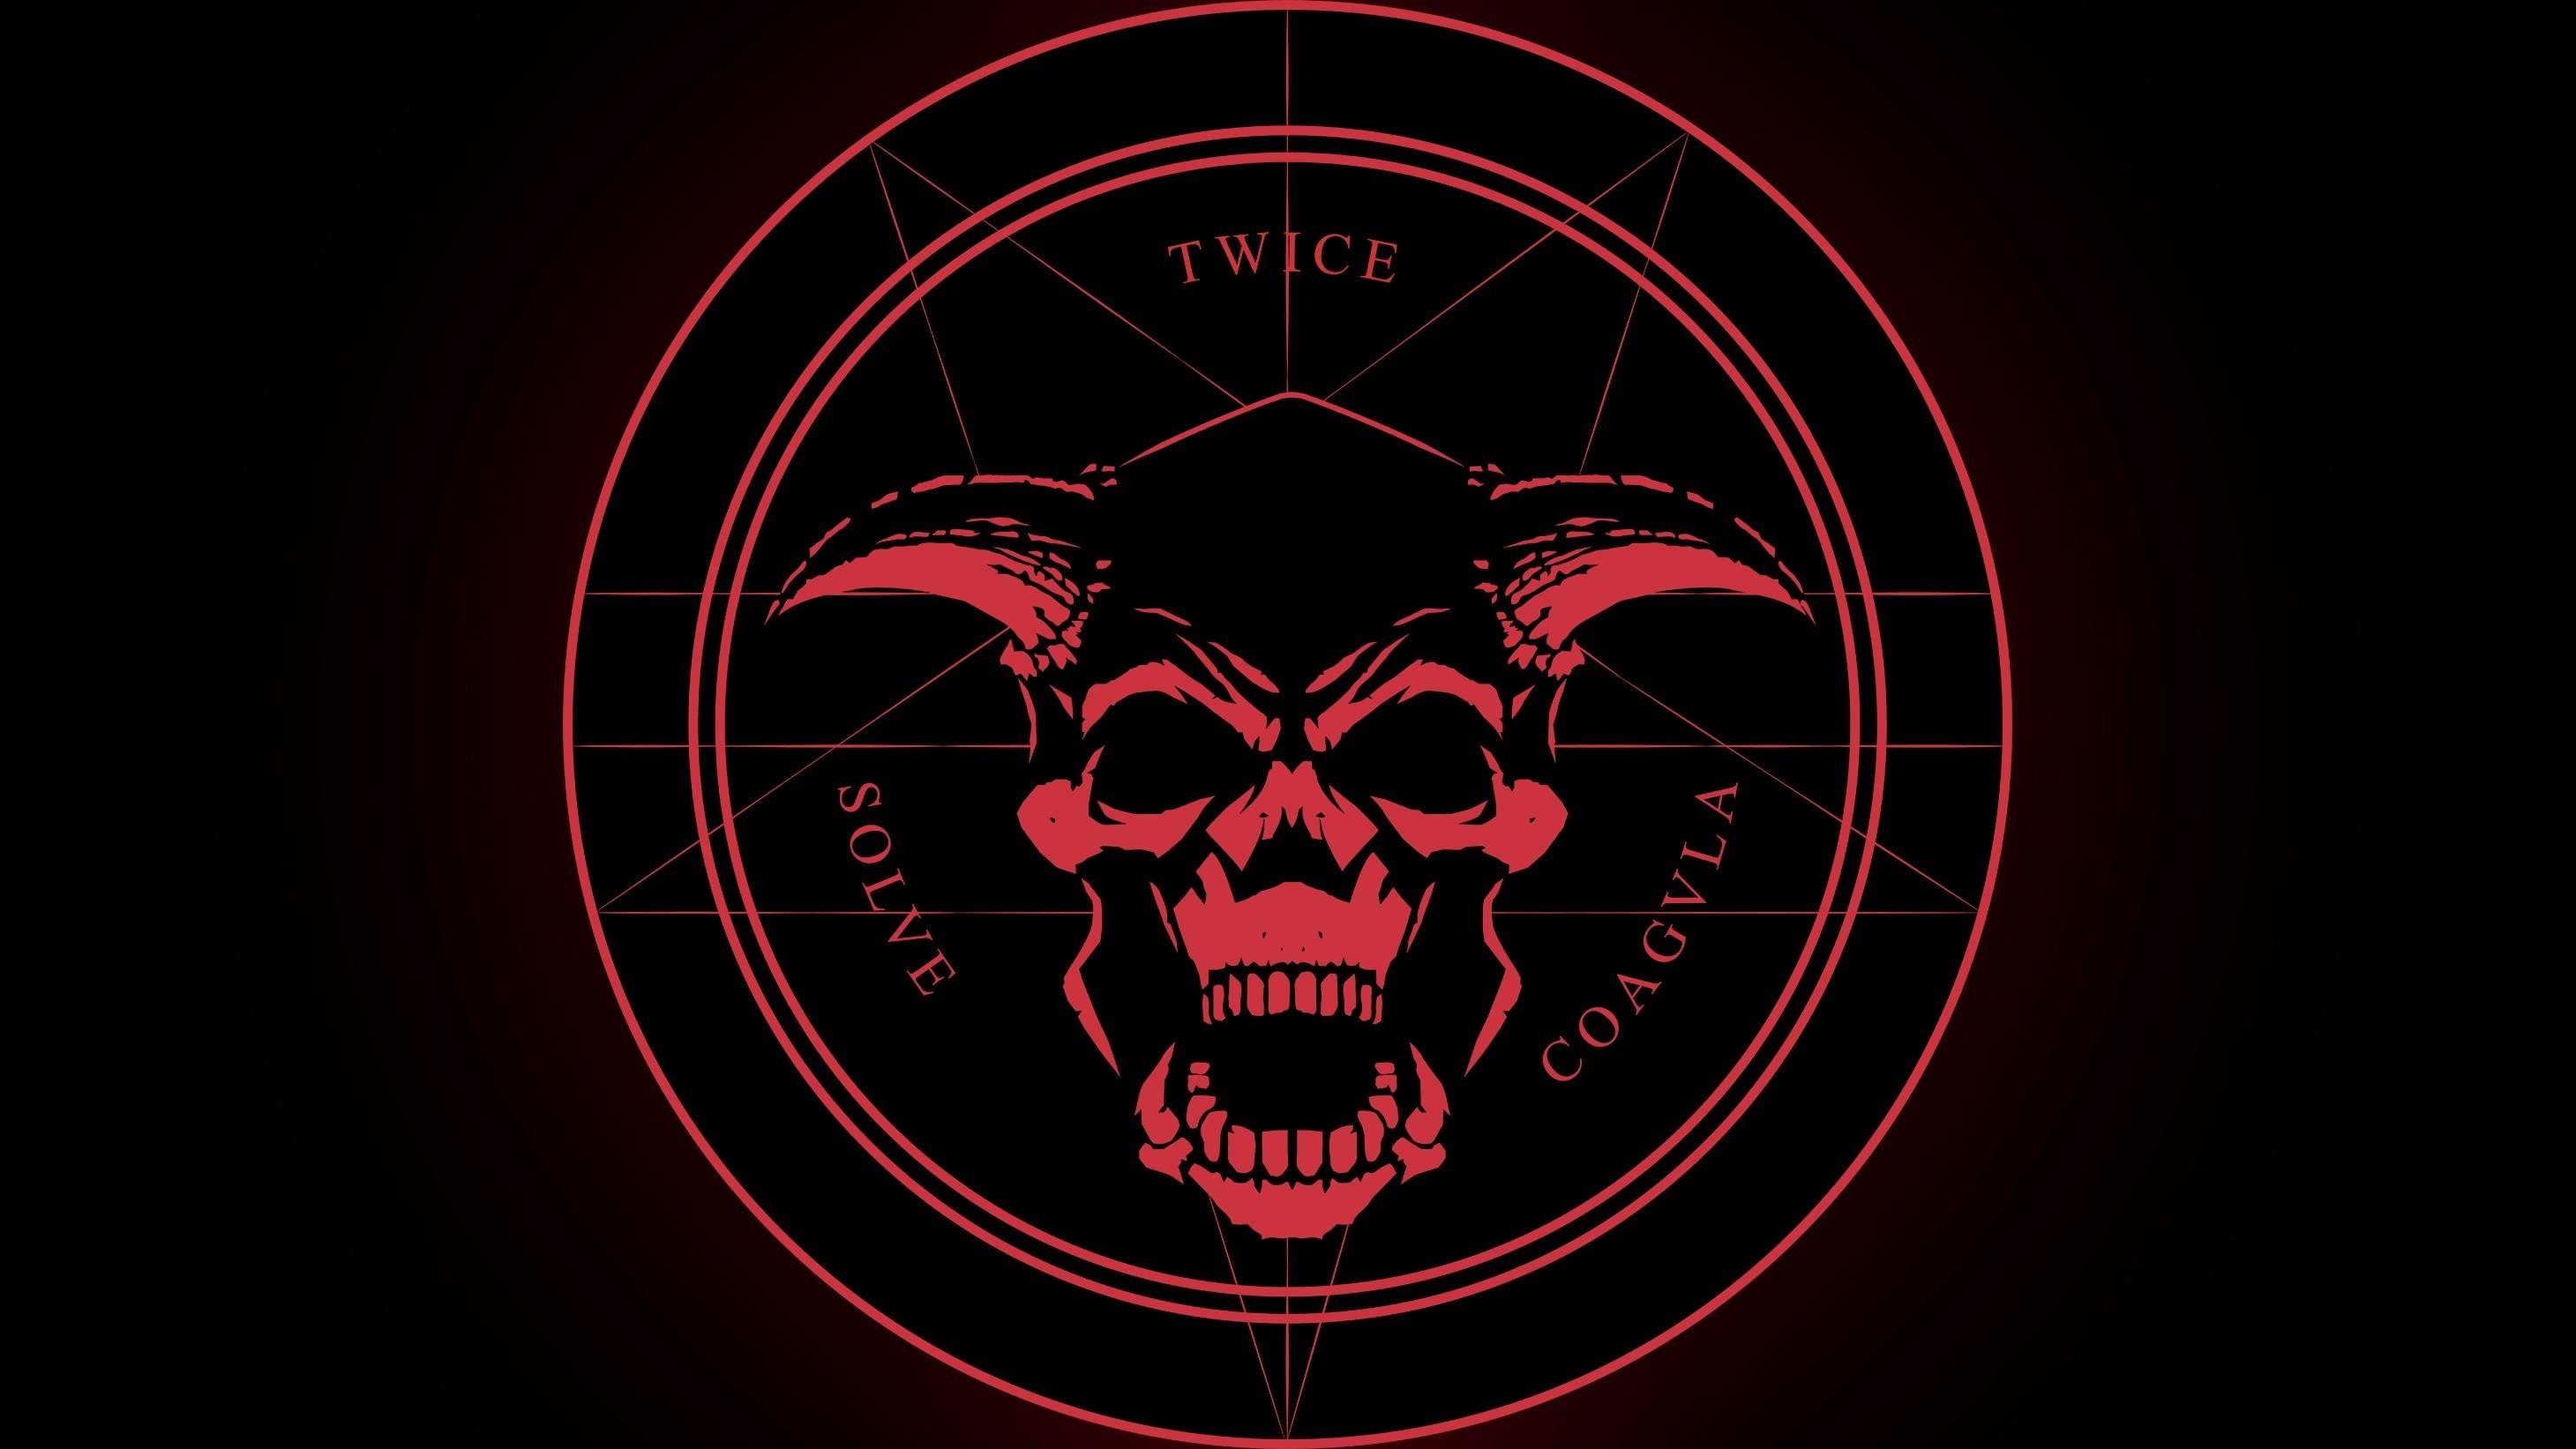 Hd Quote Wallpapers For Windows 10 Free Download Satanic Pentagram Wallpaper 183 ①